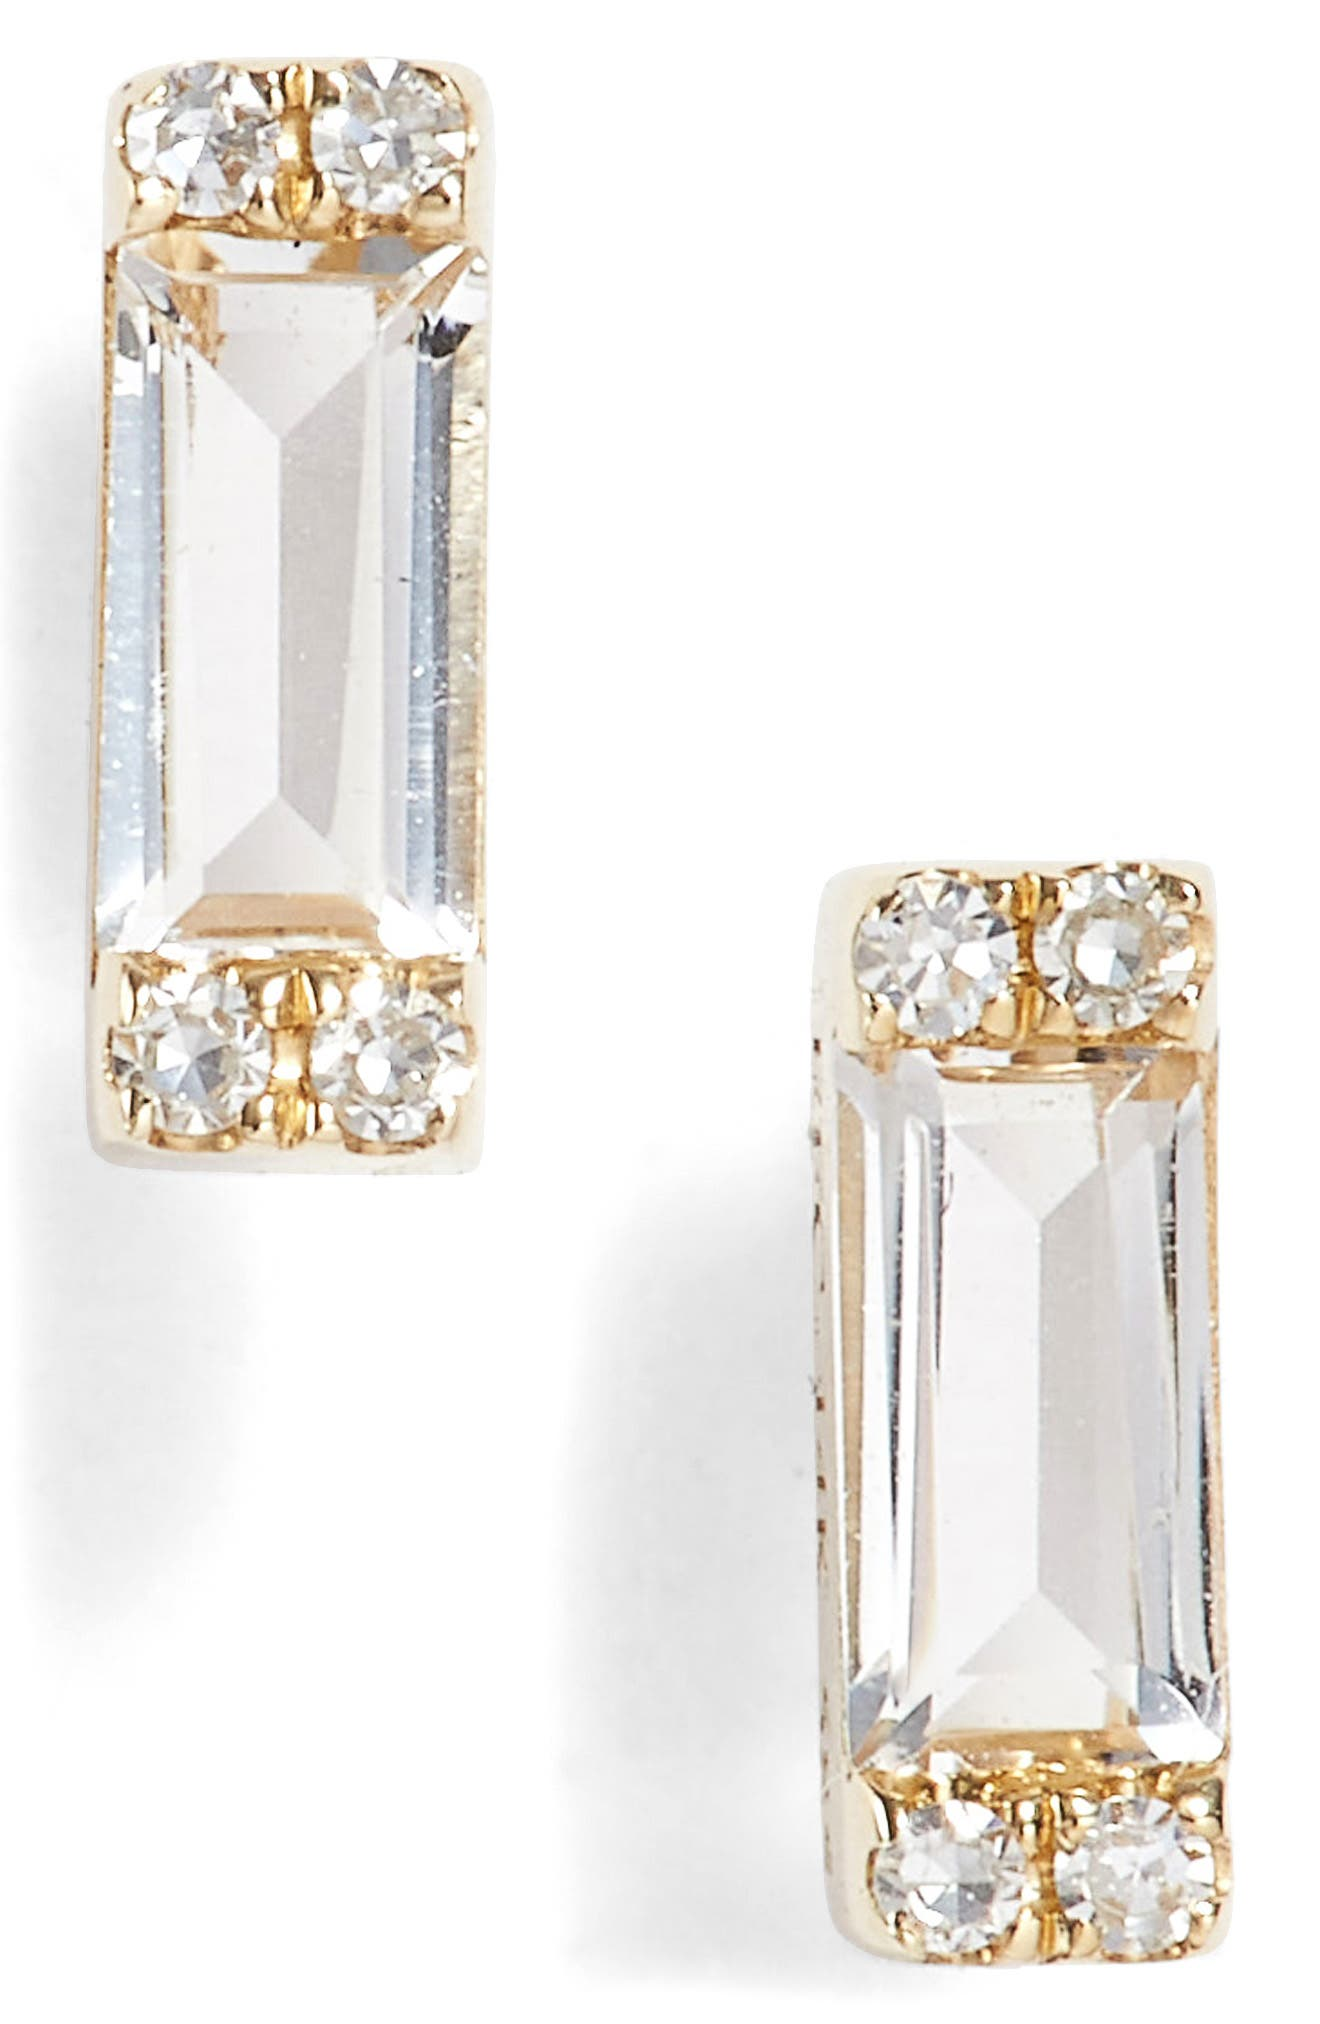 Alternate Image 1 Selected - EF COLLECTION Diamond & Topaz Baguette Stud Earrings